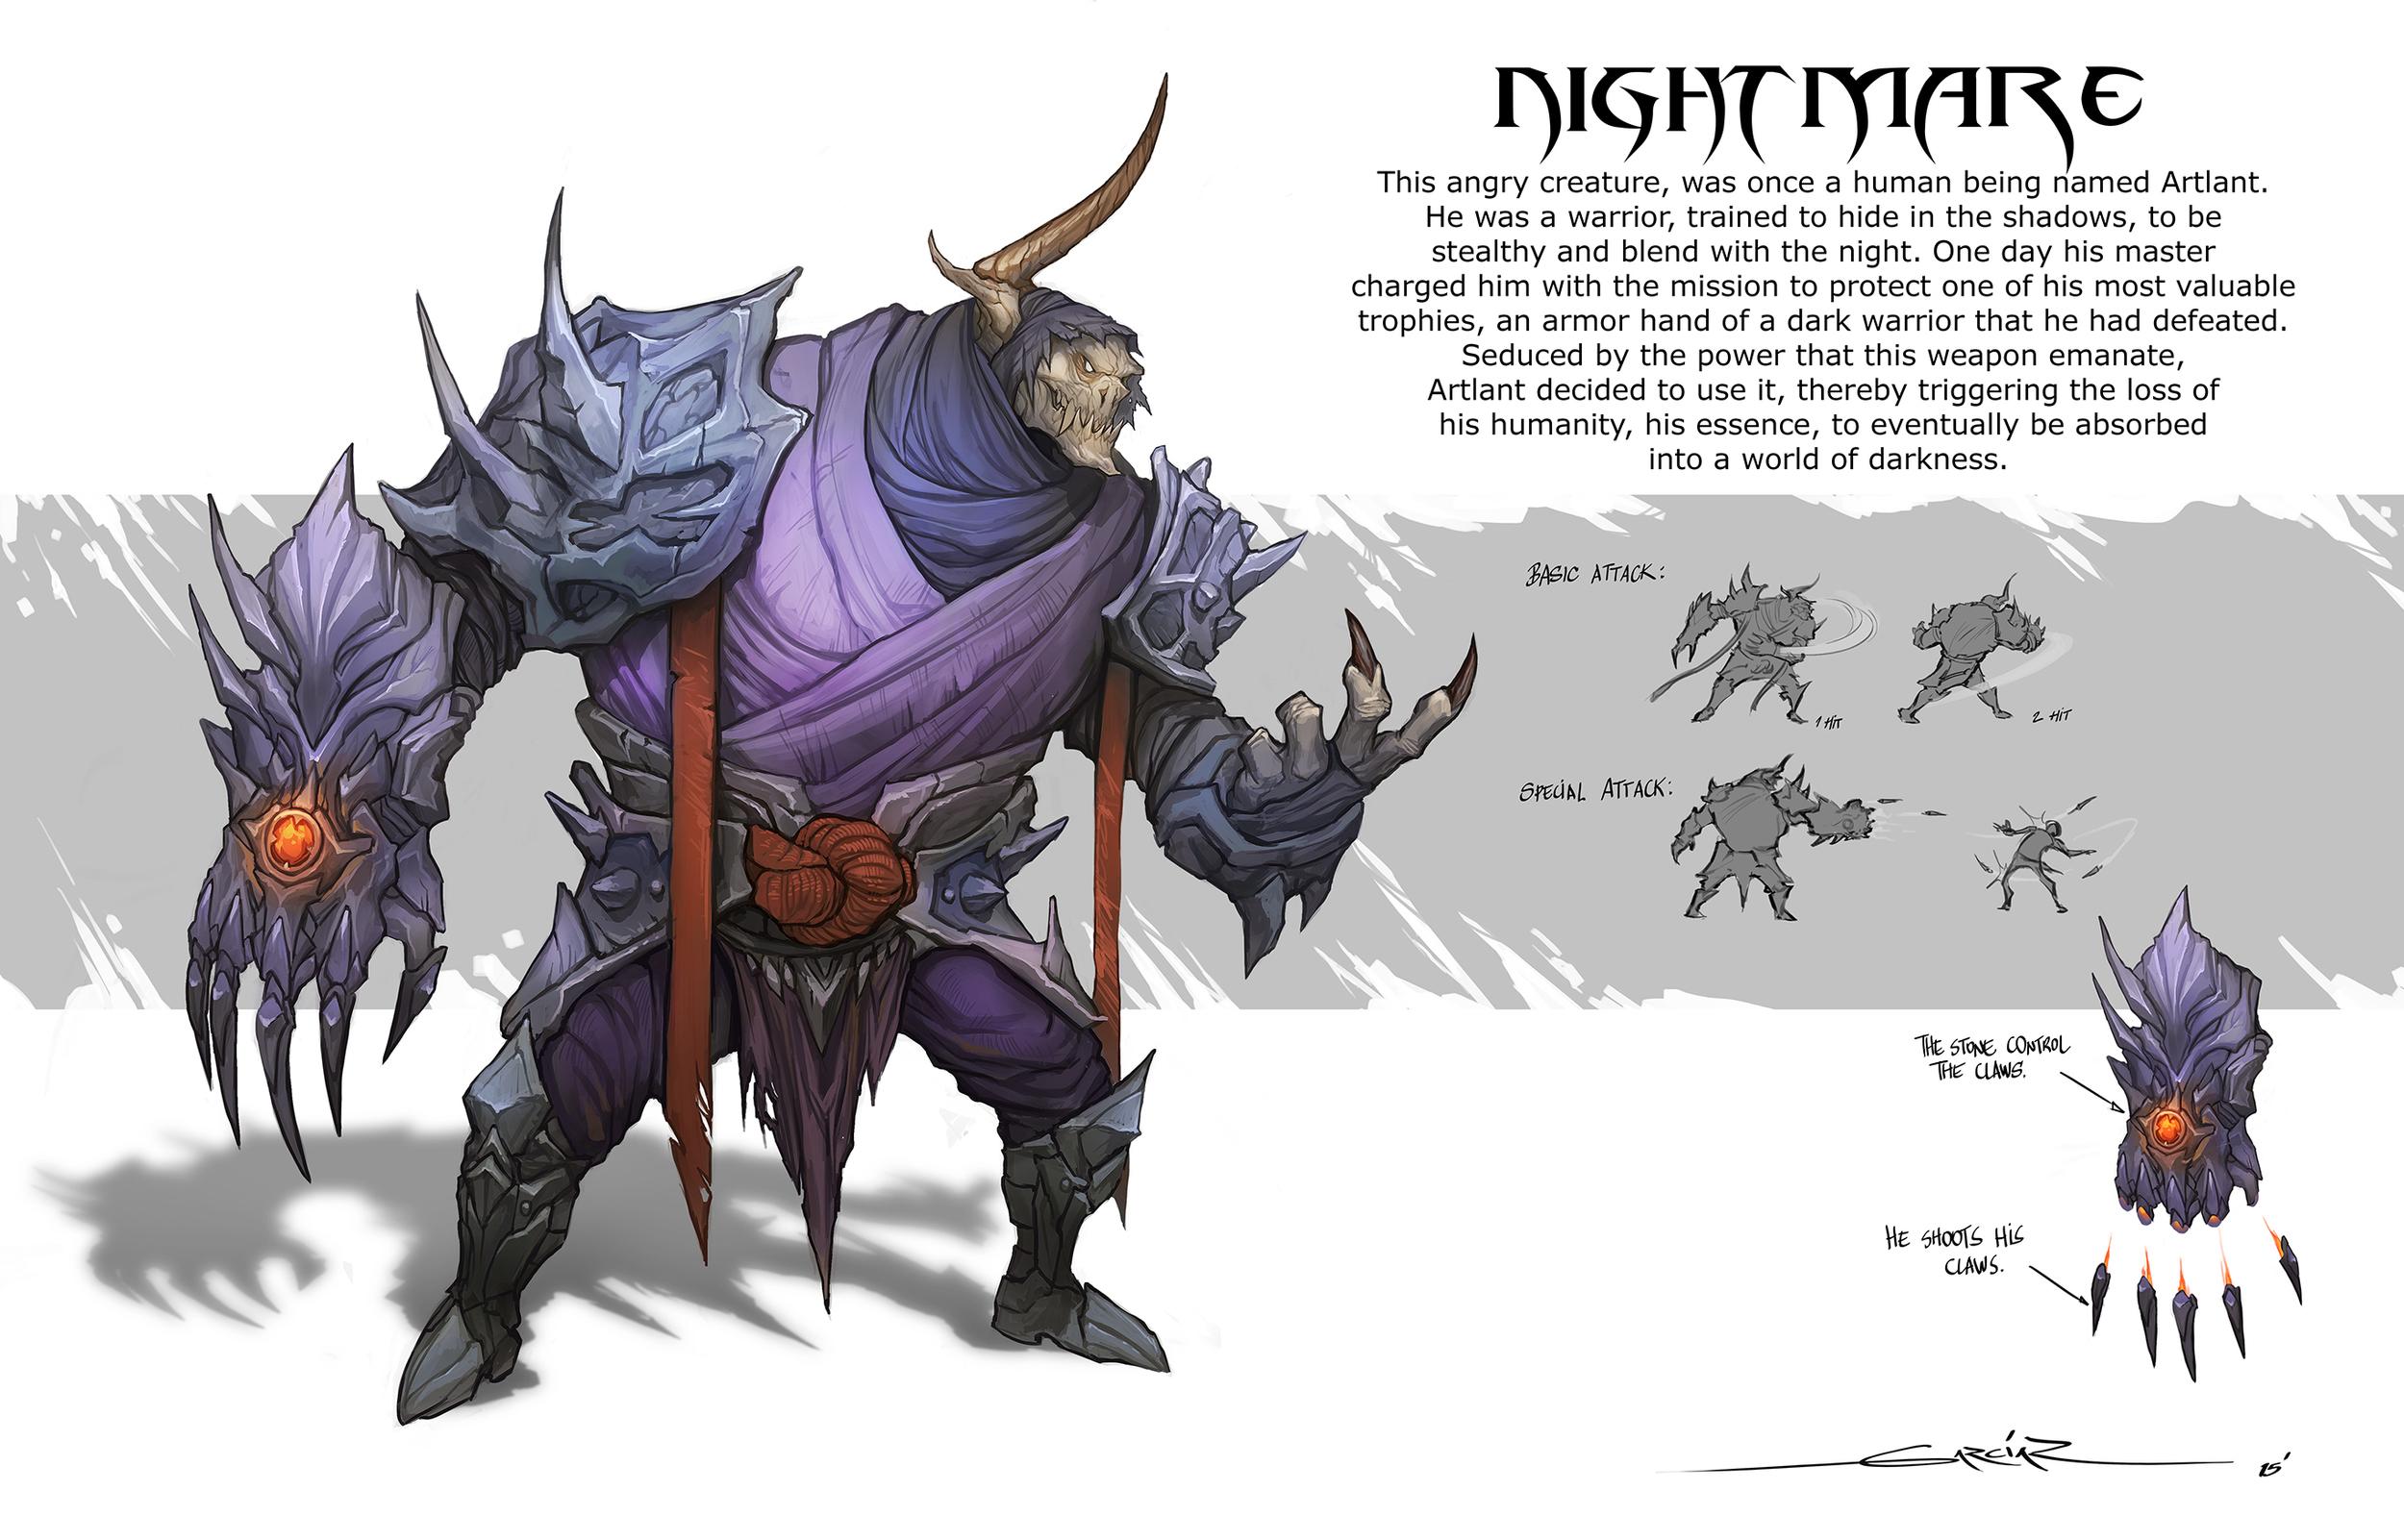 Nightwar1done.jpg